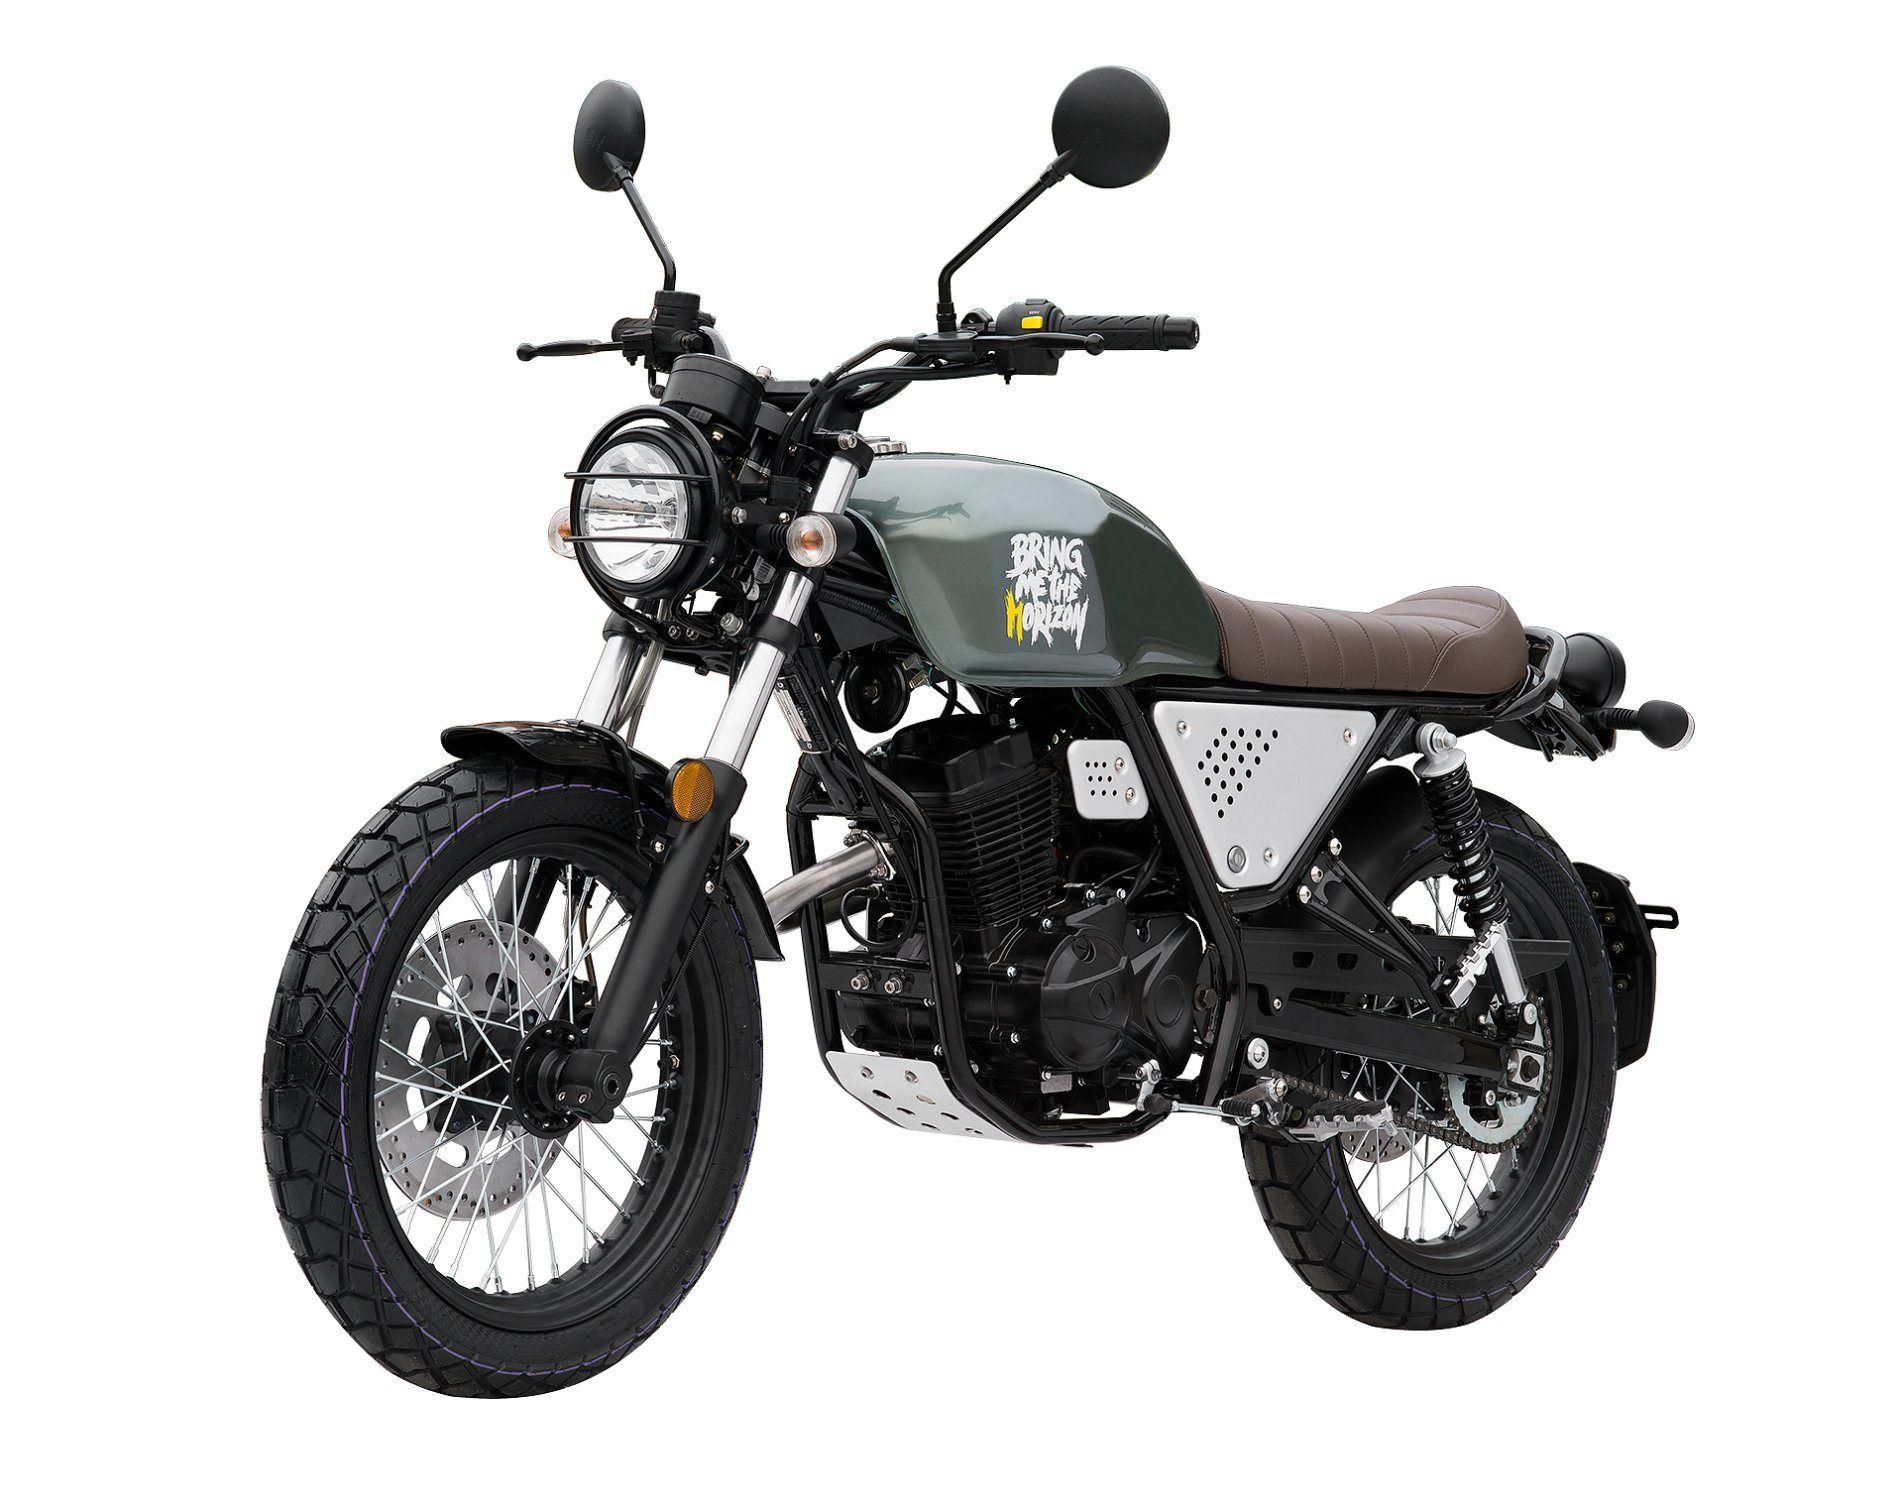 China Scrambler 100cc 125cc Moto 2 Stroke Euro Iv 4 Approval 150cc Eec Sport Street Cafe Racing Motorcycle In 2021 Racing Motorcycles Cafe Racing Scrambler